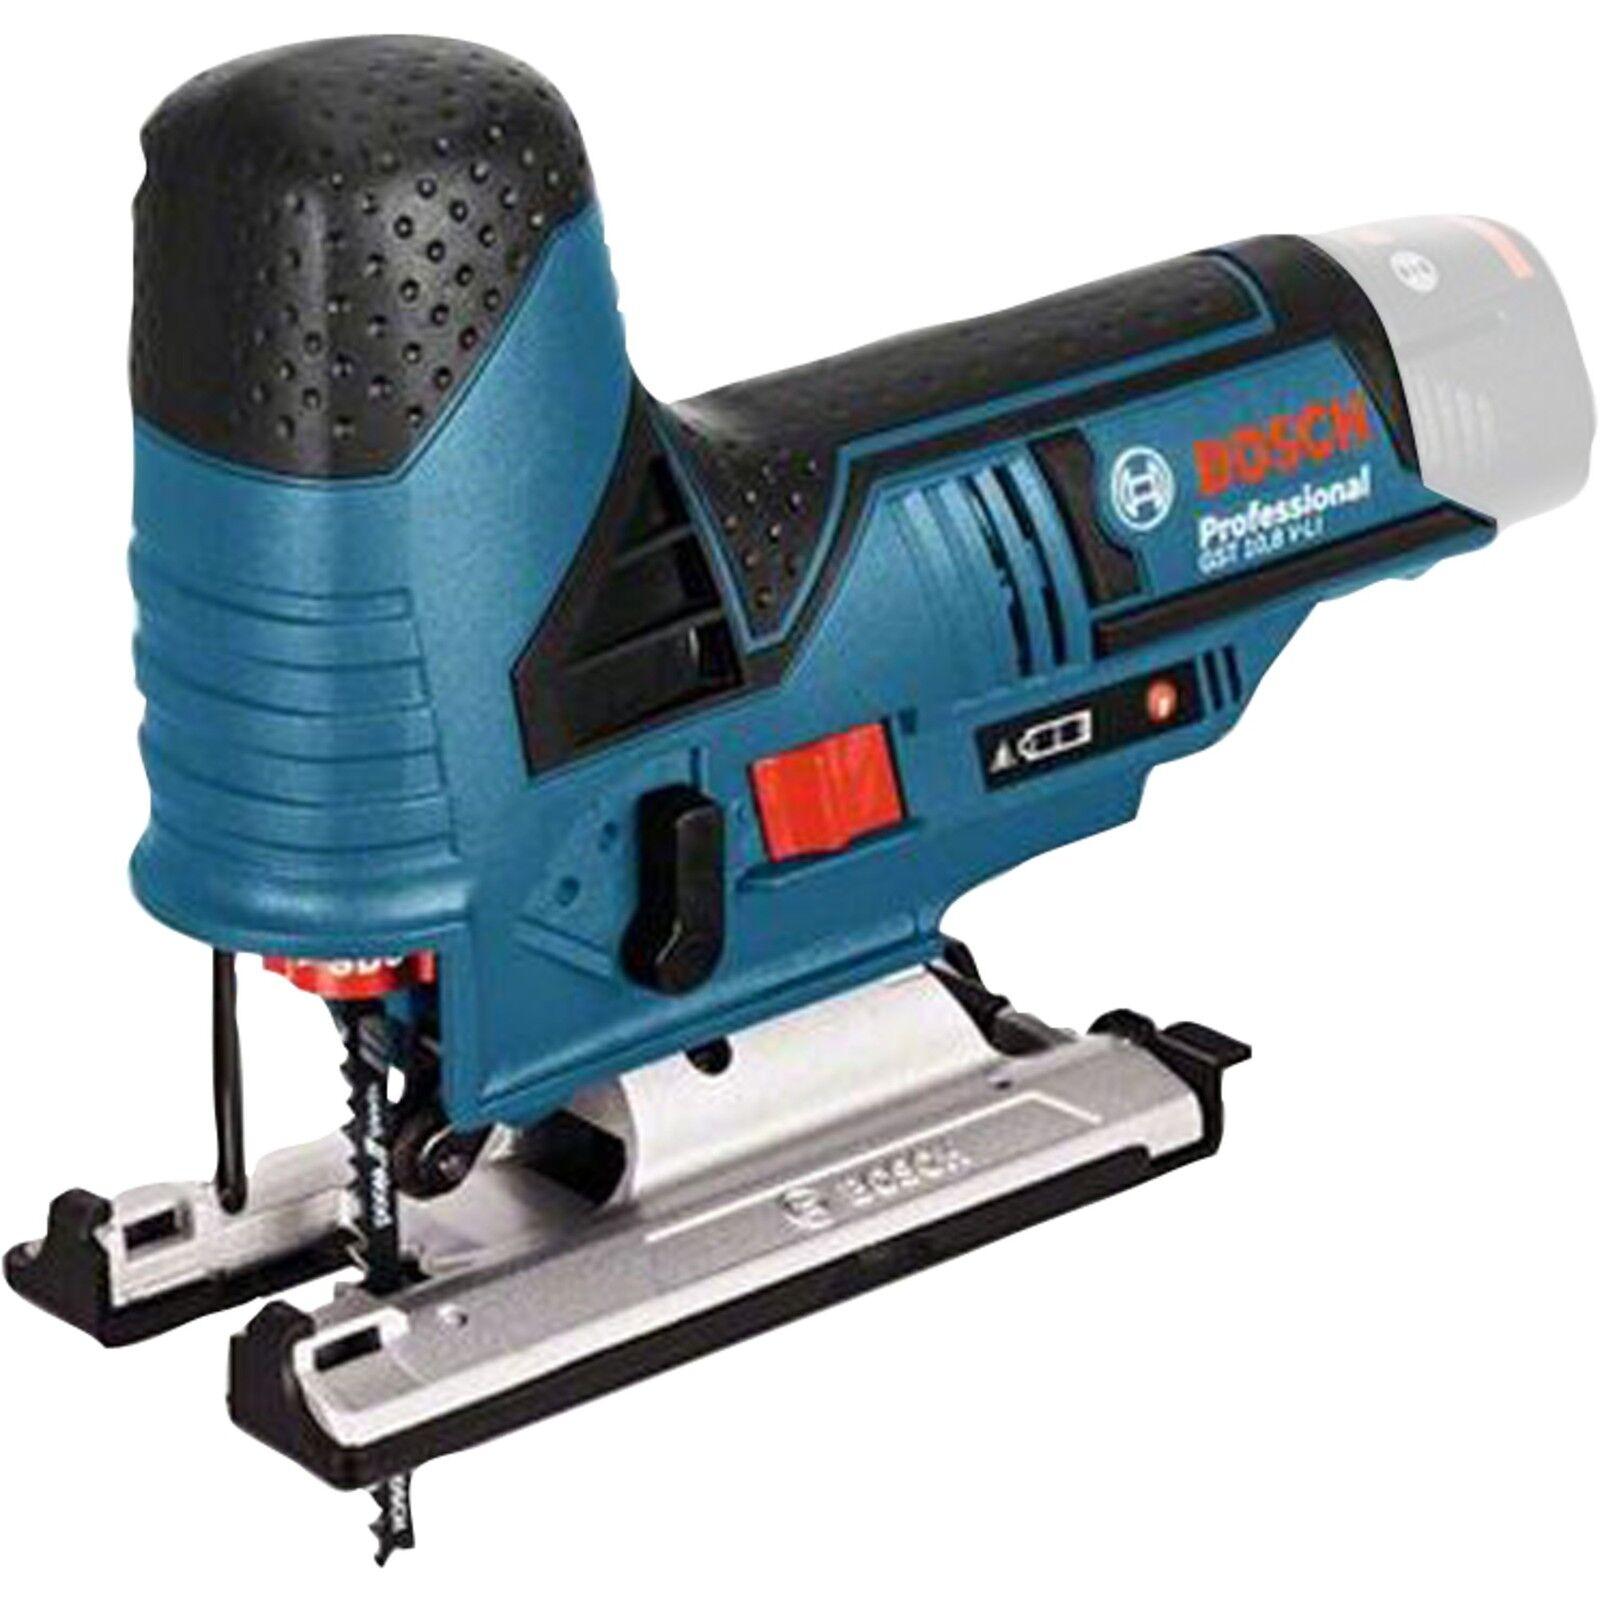 Bosch Professional Akku-Stichsäge GST 12V-70 solo Professional, 12 Volt, blau